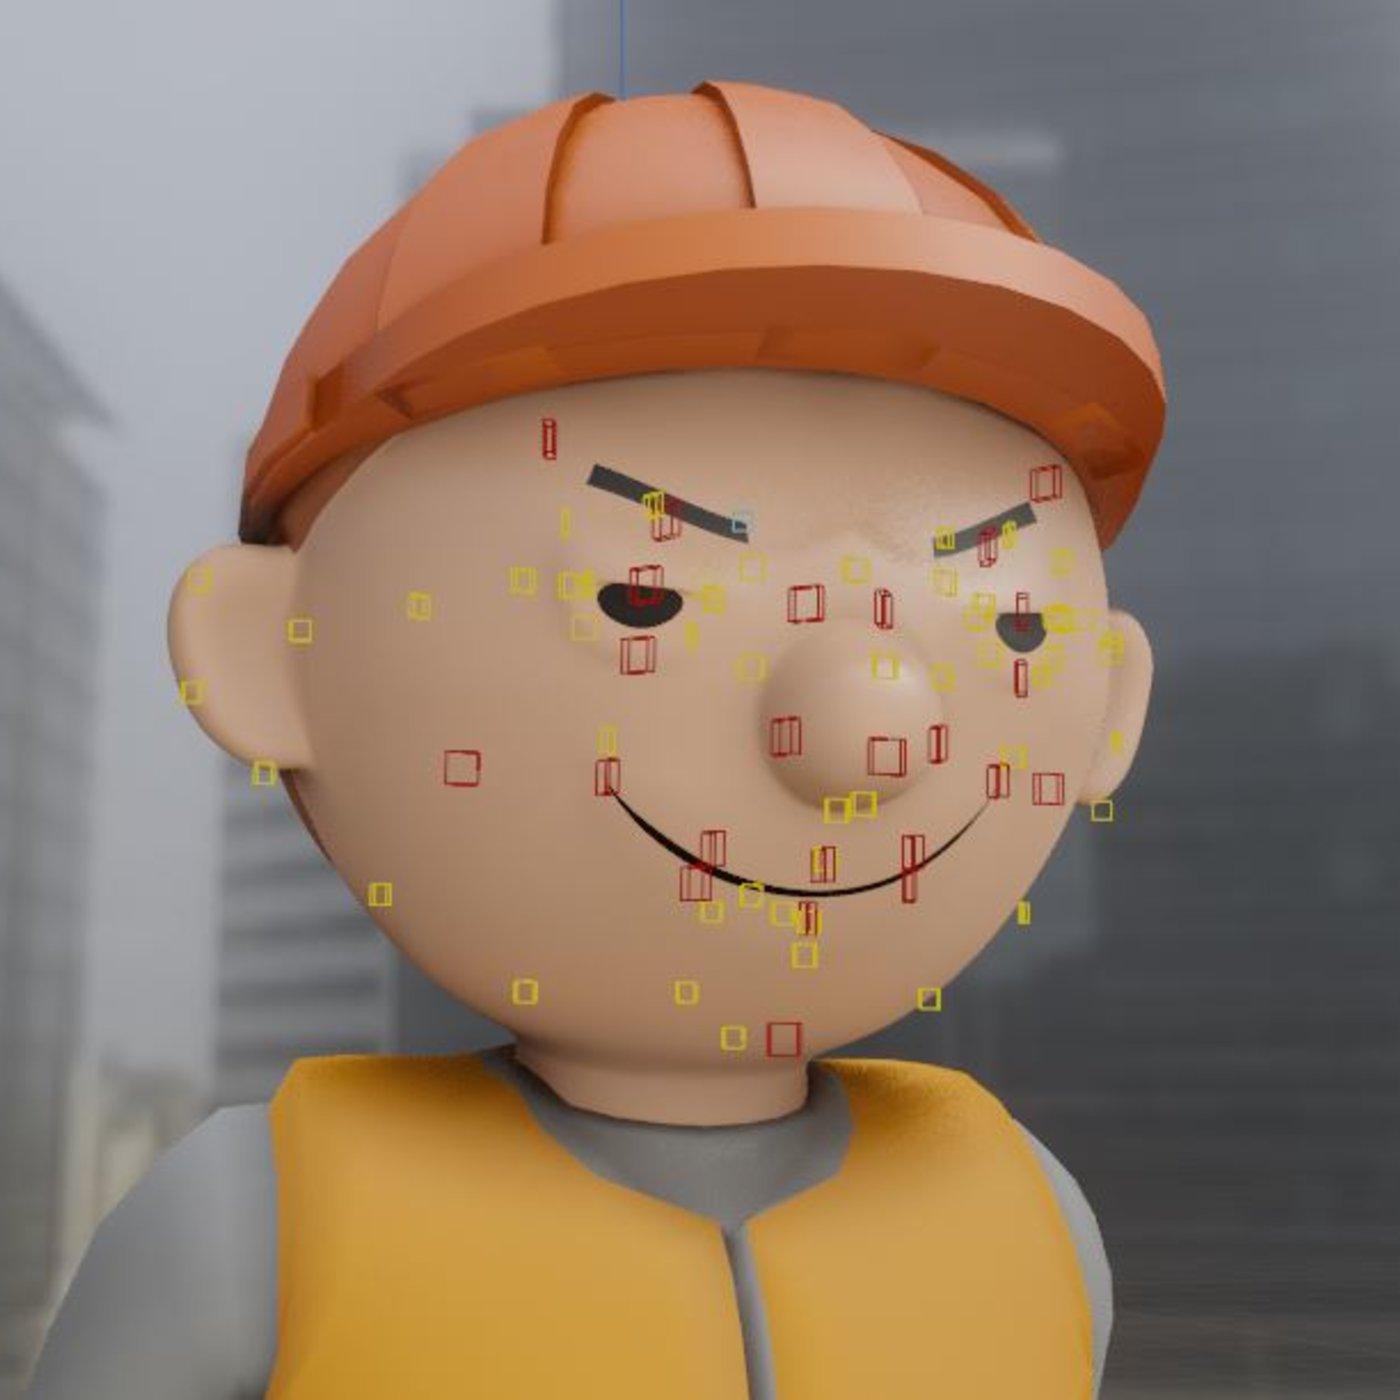 Cartoon Construction Worker Face Rig Tests (Rigify) Blender-2.90.1